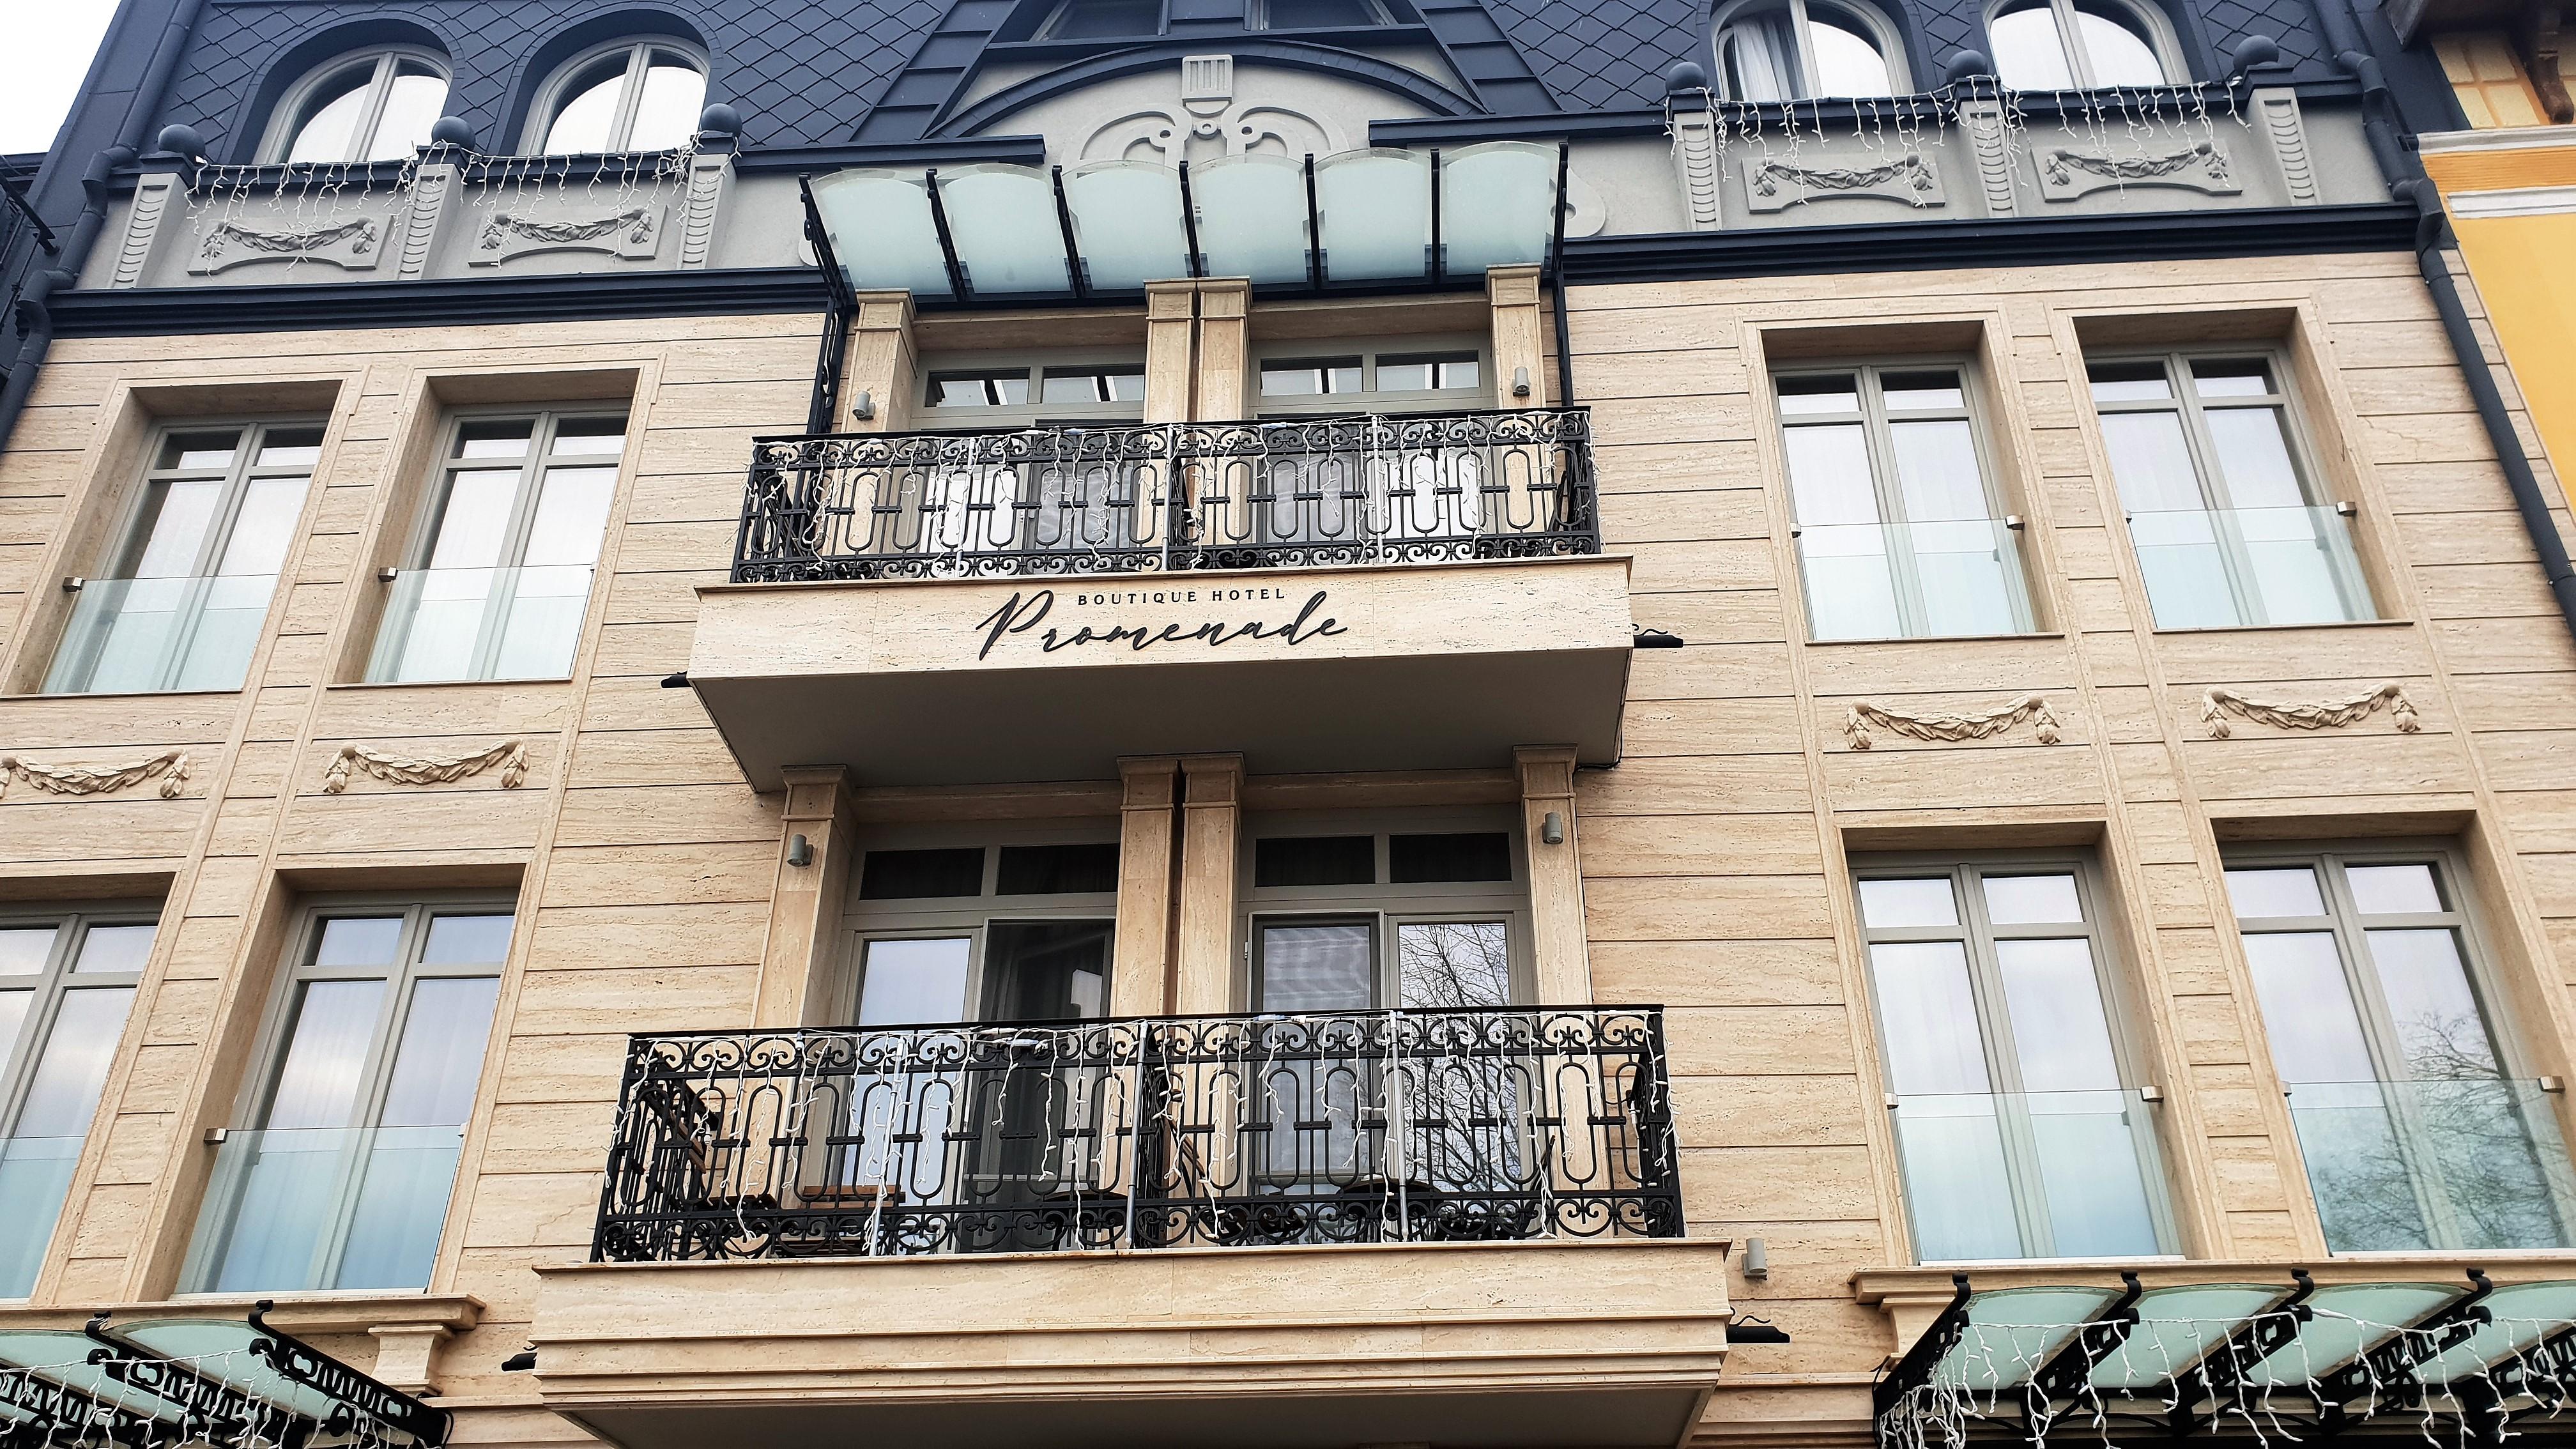 Hotel Promenade, Burgas, placescases.com